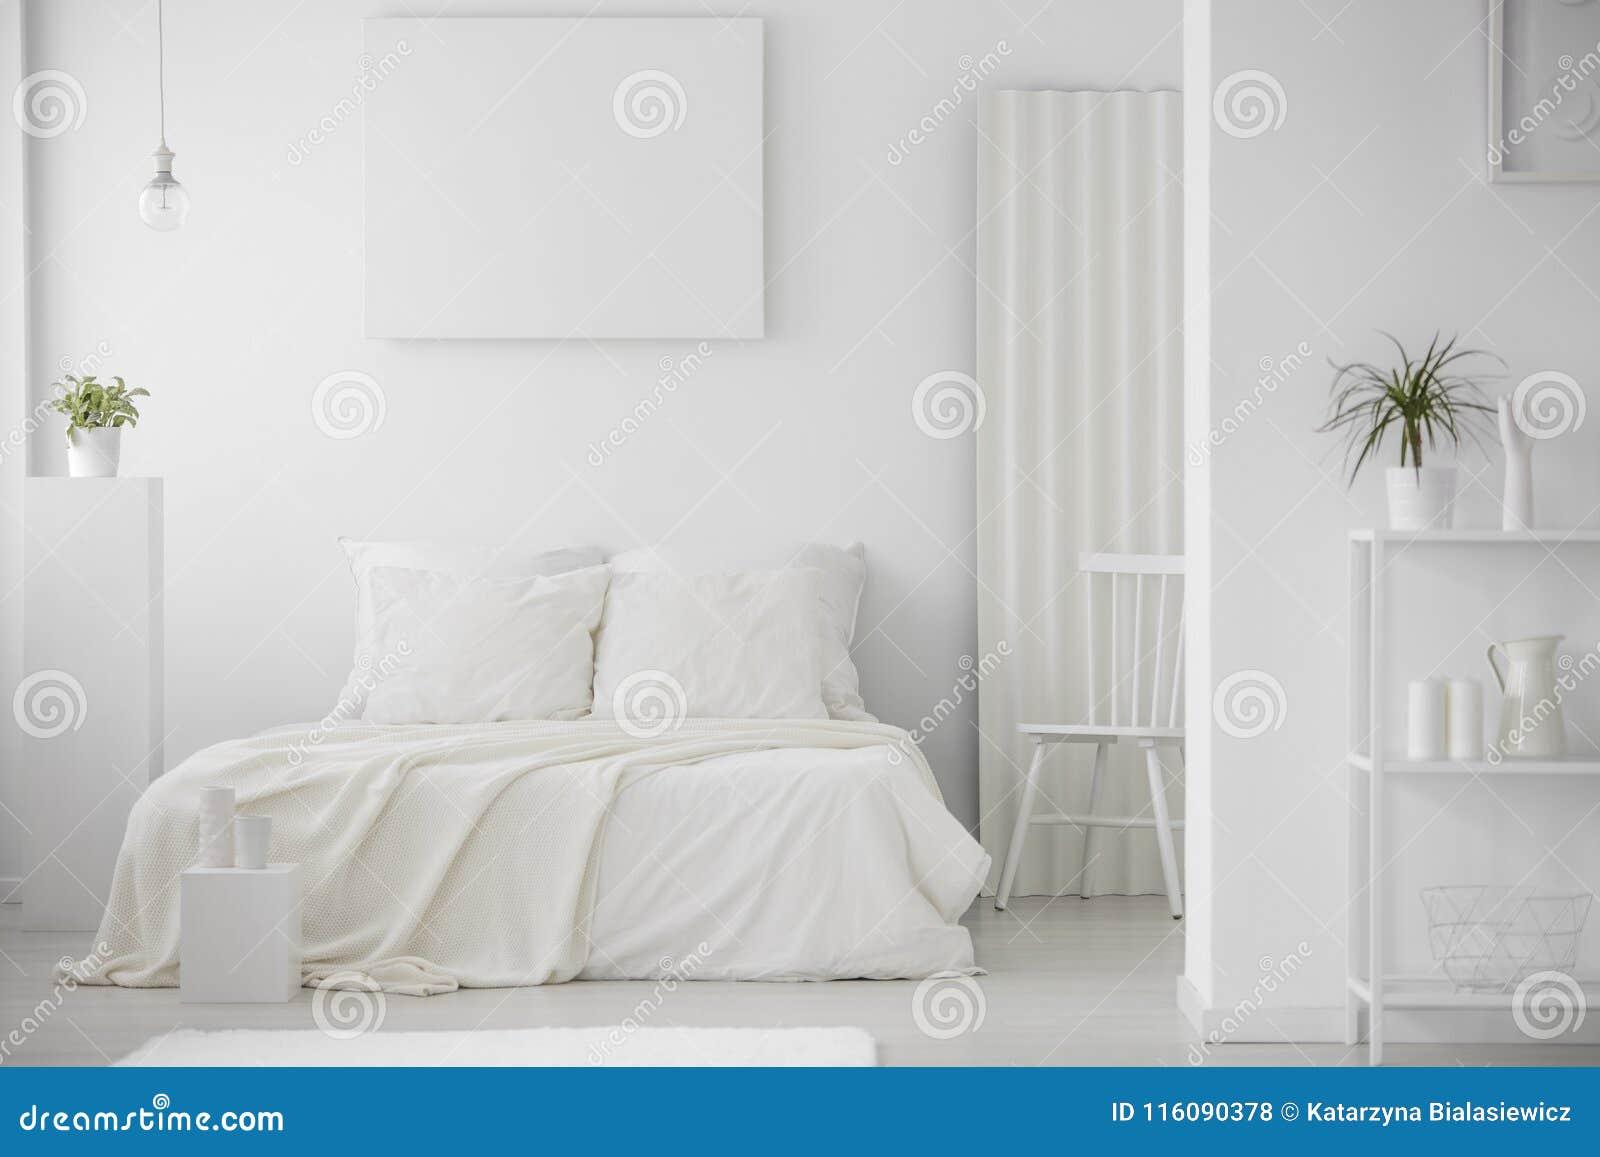 Simple, Minimal, White Bedroom Interior Stock Photo - Image ...